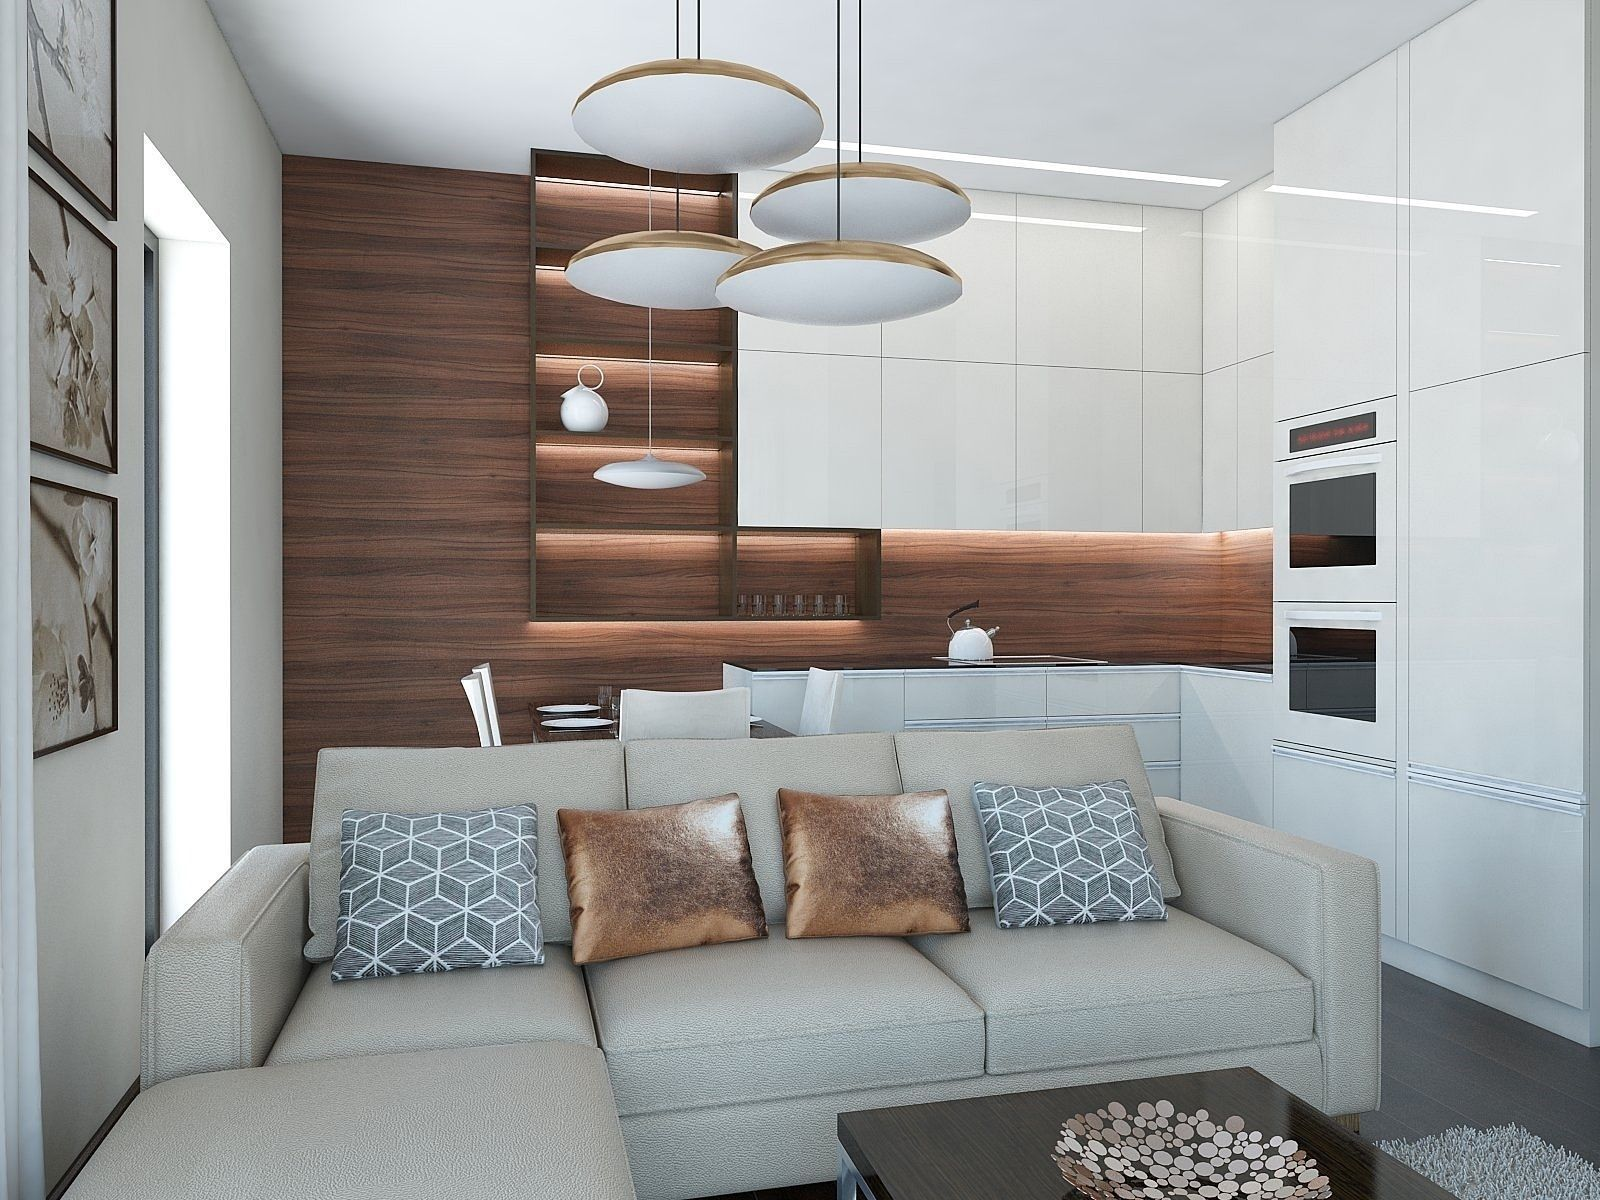 Nice Living Room 3d Model Max Obj 3ds Fbx Skp 1 ...